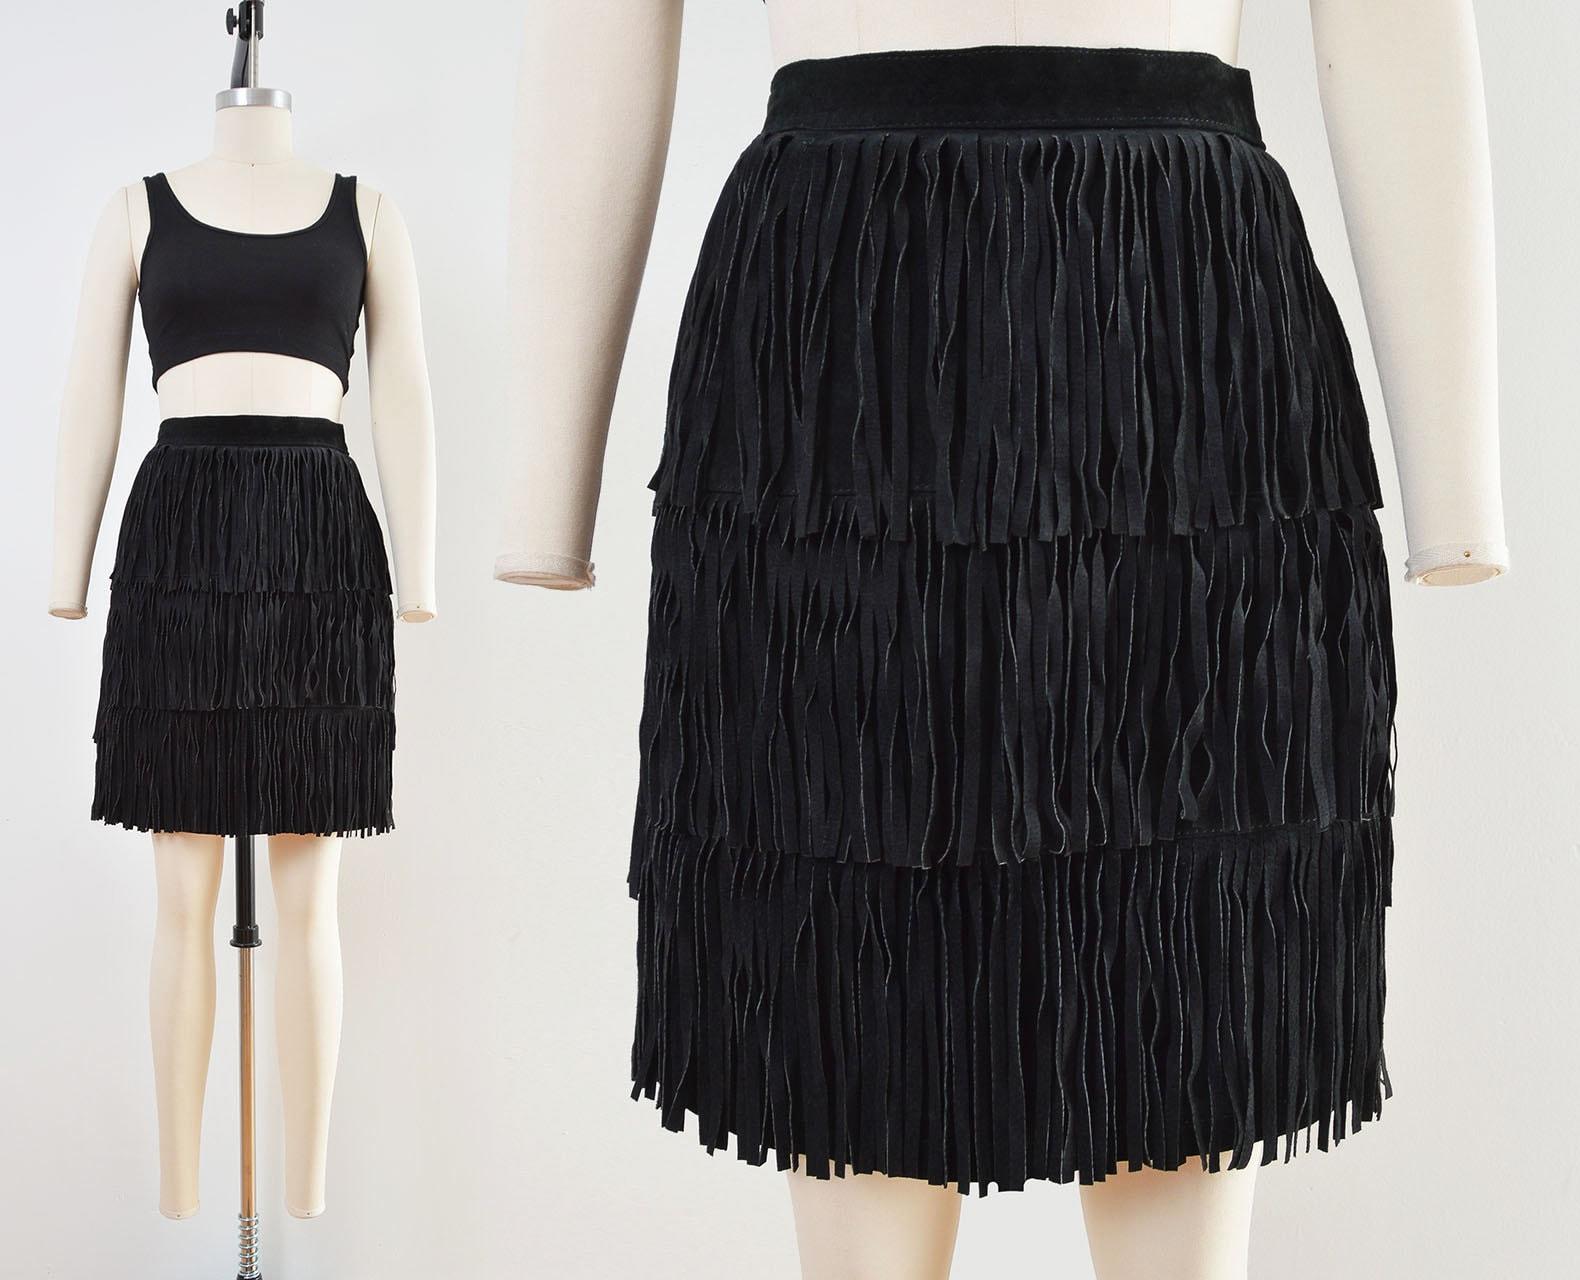 80s Dresses | Casual to Party Dresses Vintage Black Suede Skirt  Fringe Mini Leather Pencil Size Small $58.00 AT vintagedancer.com